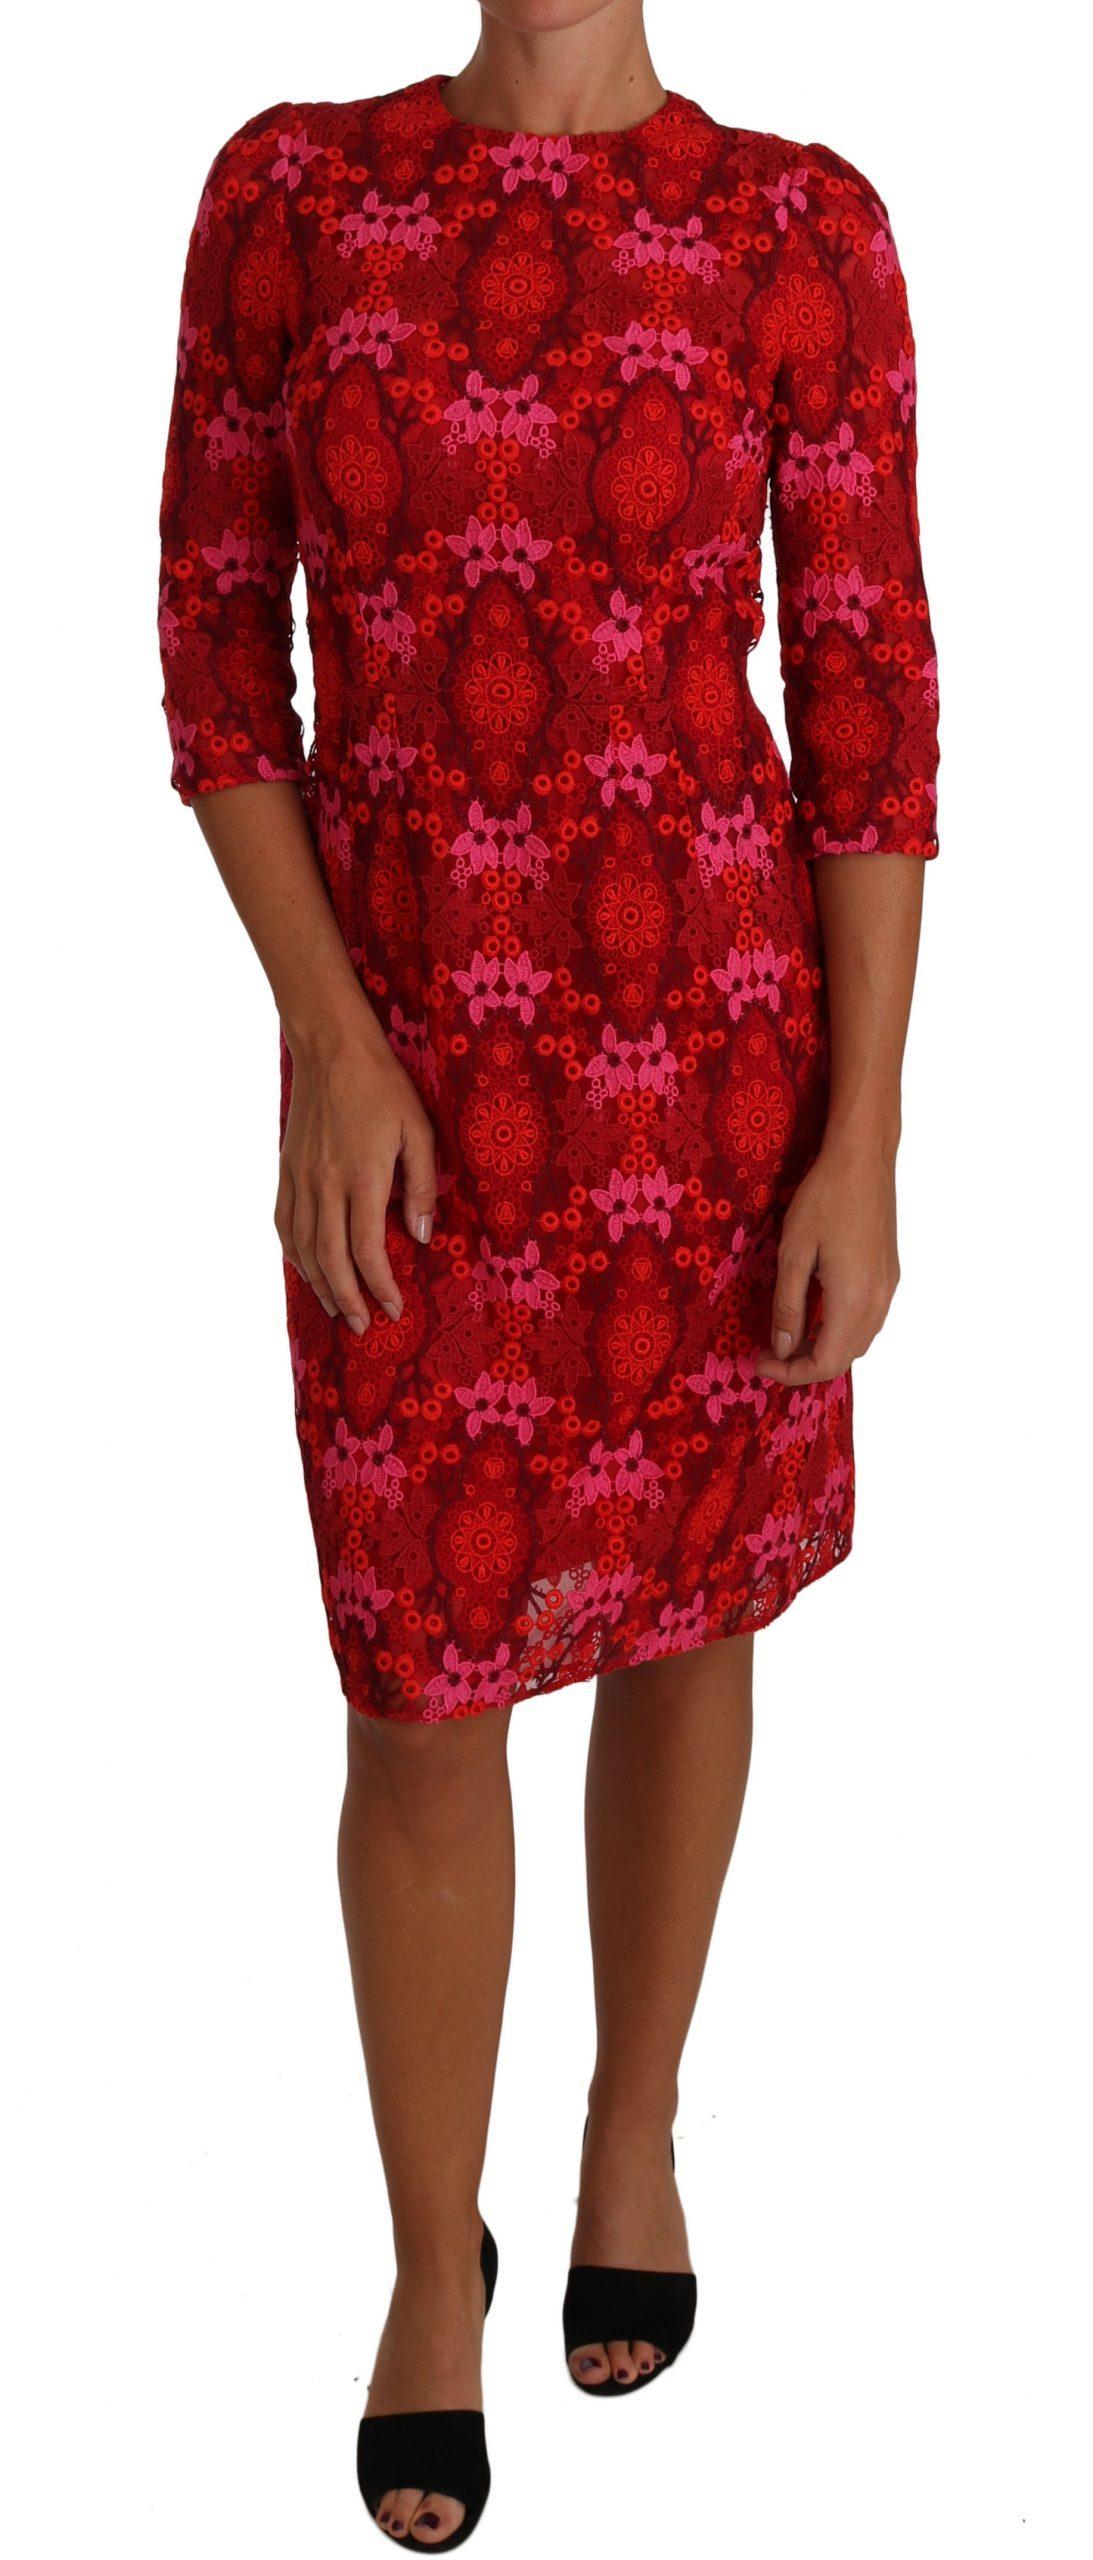 Dolce & Gabbana Women's Floral Crochet Lace Sheath Dress Pink DR1458 - IT40|S